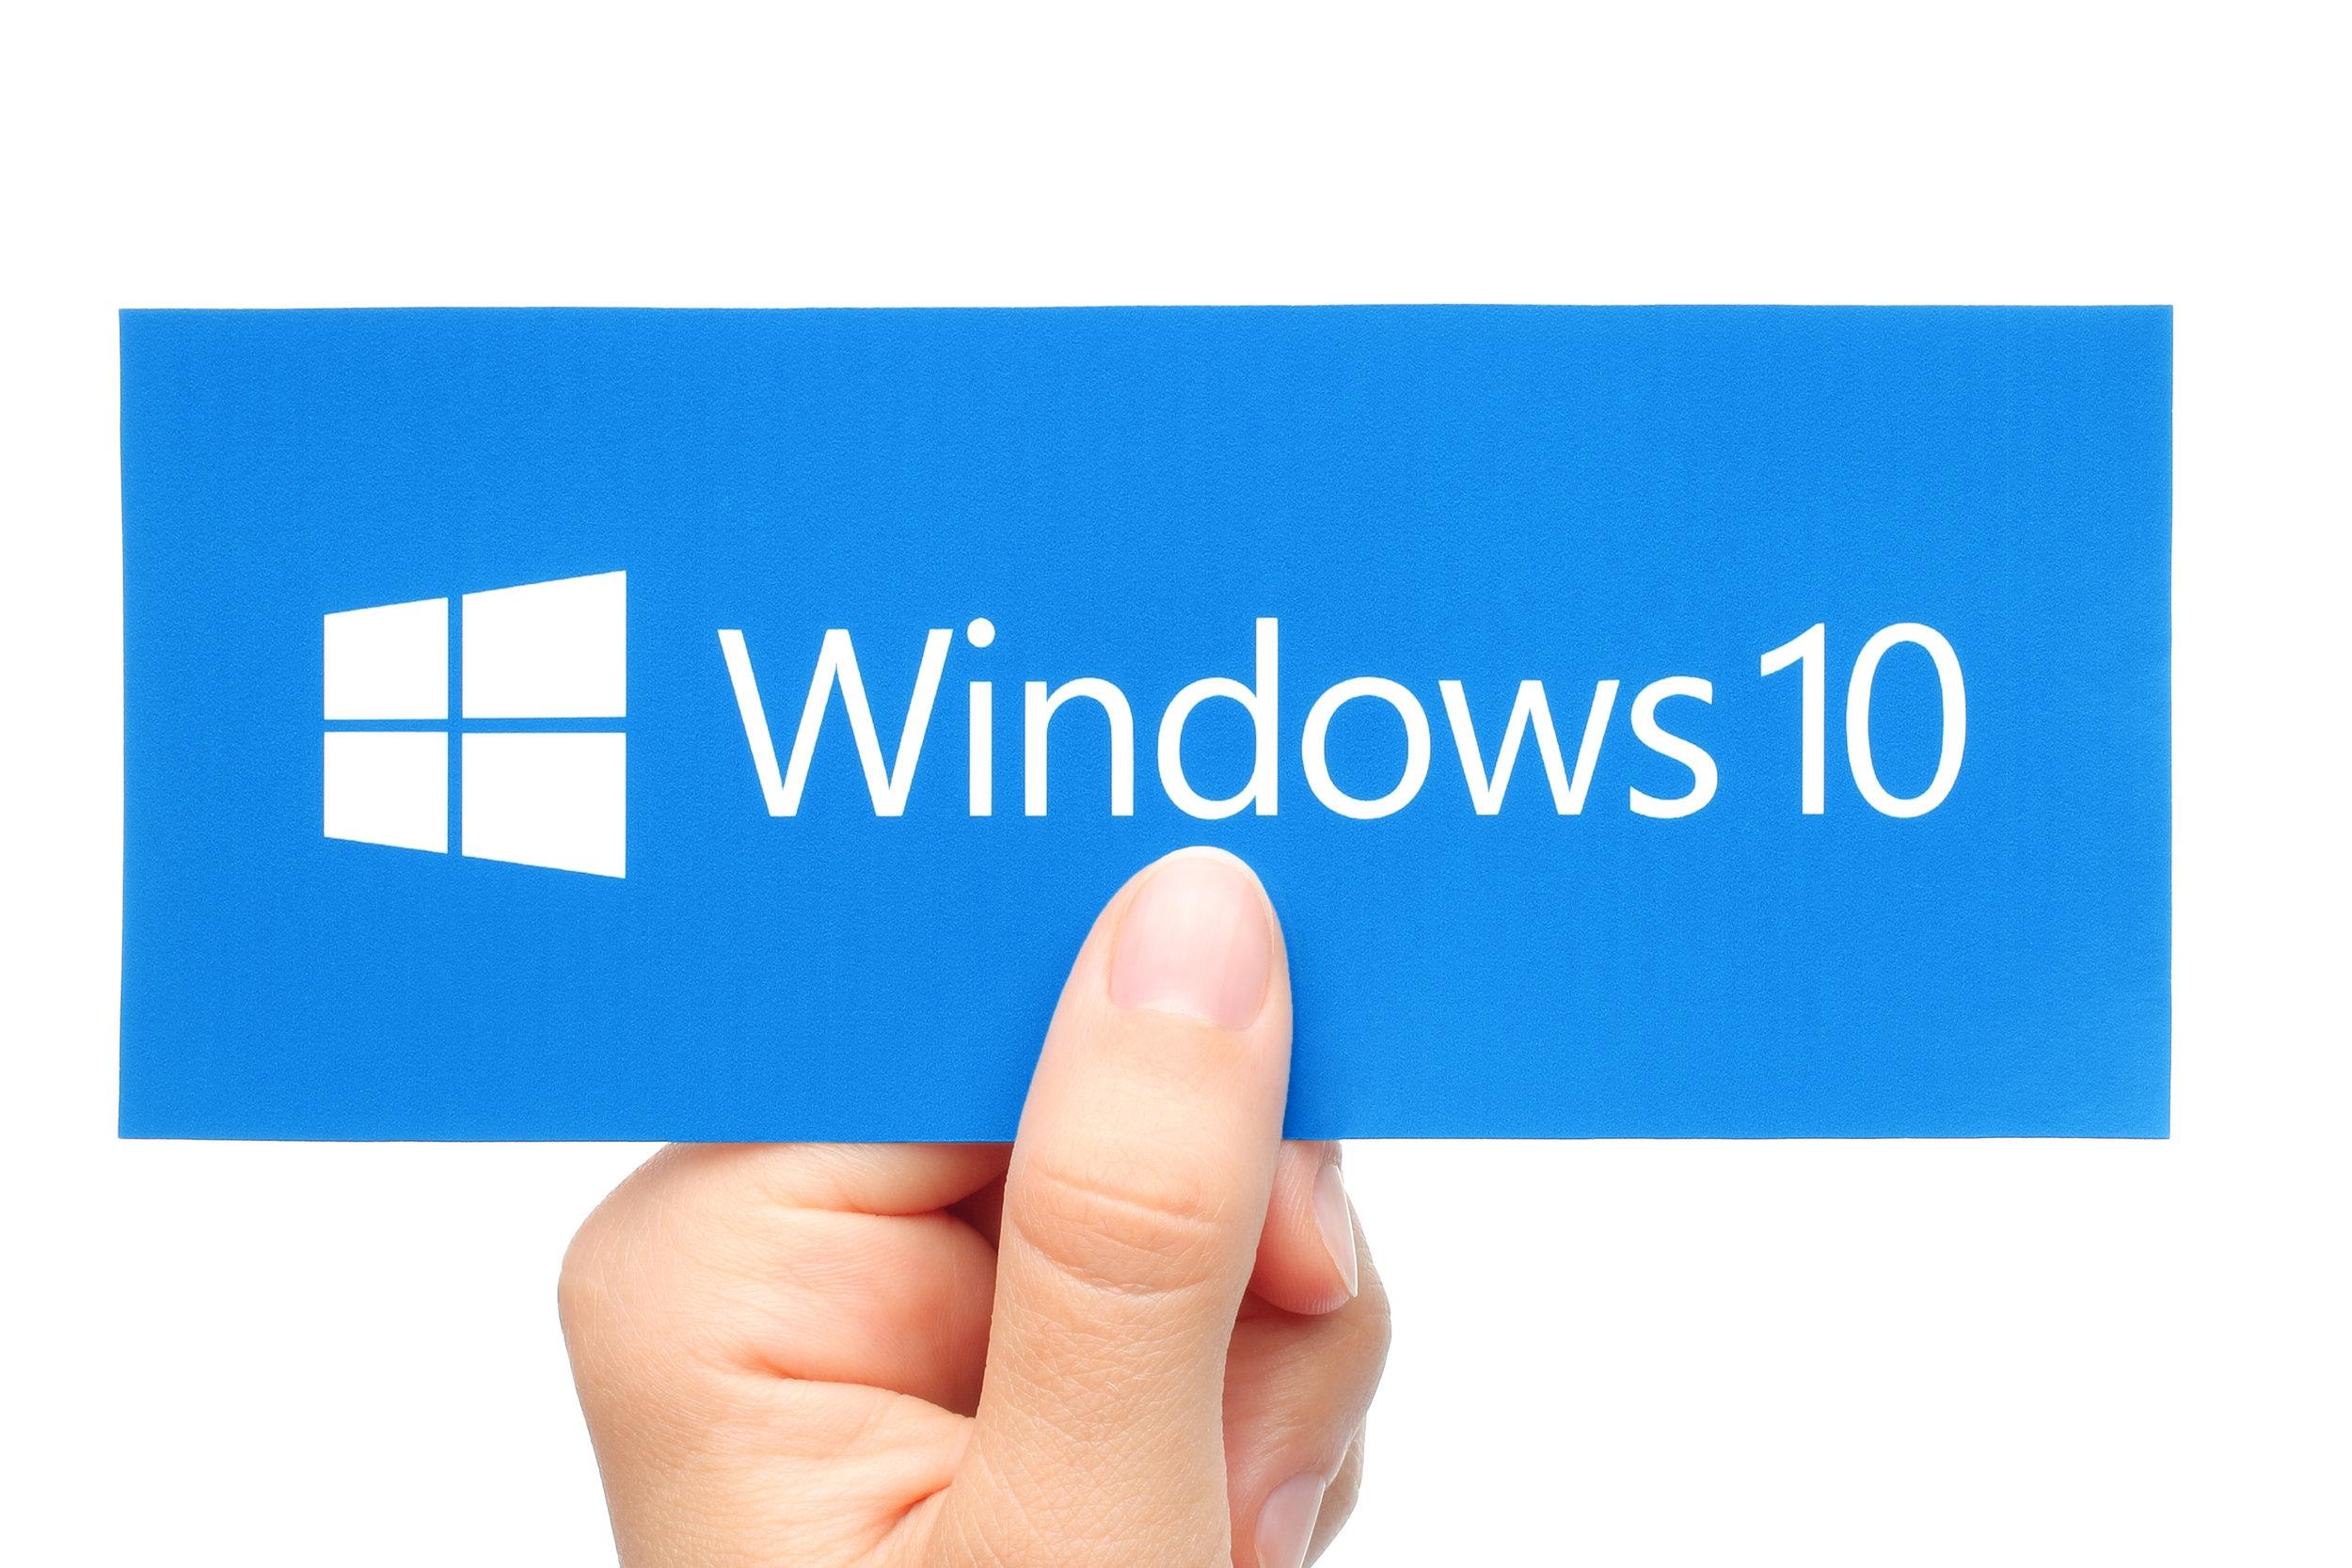 bigstock-Hand-holds-Windows--logotype-103334630.jpg